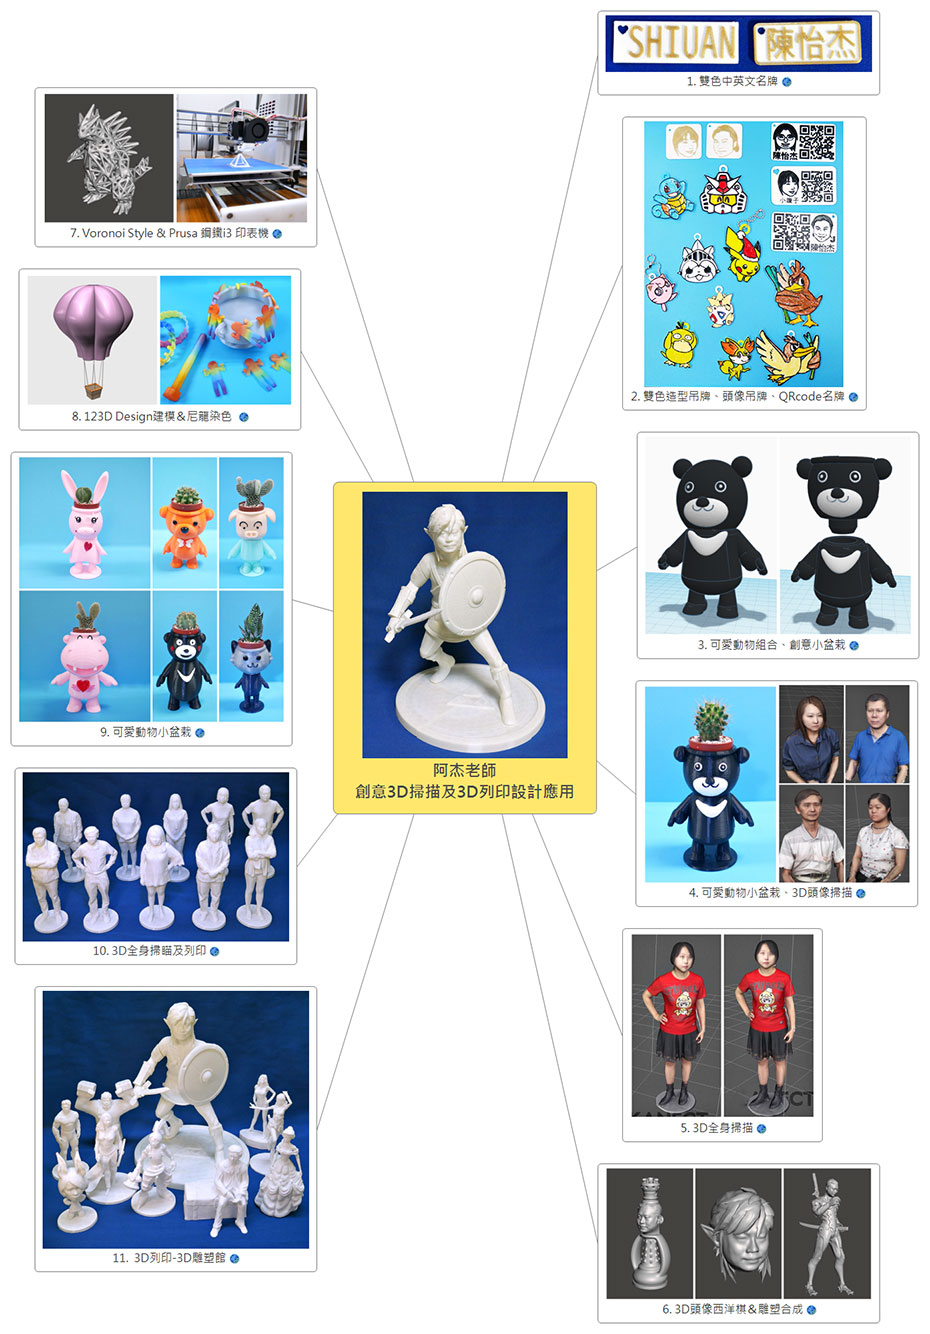 3D掃描&3D列印課 10